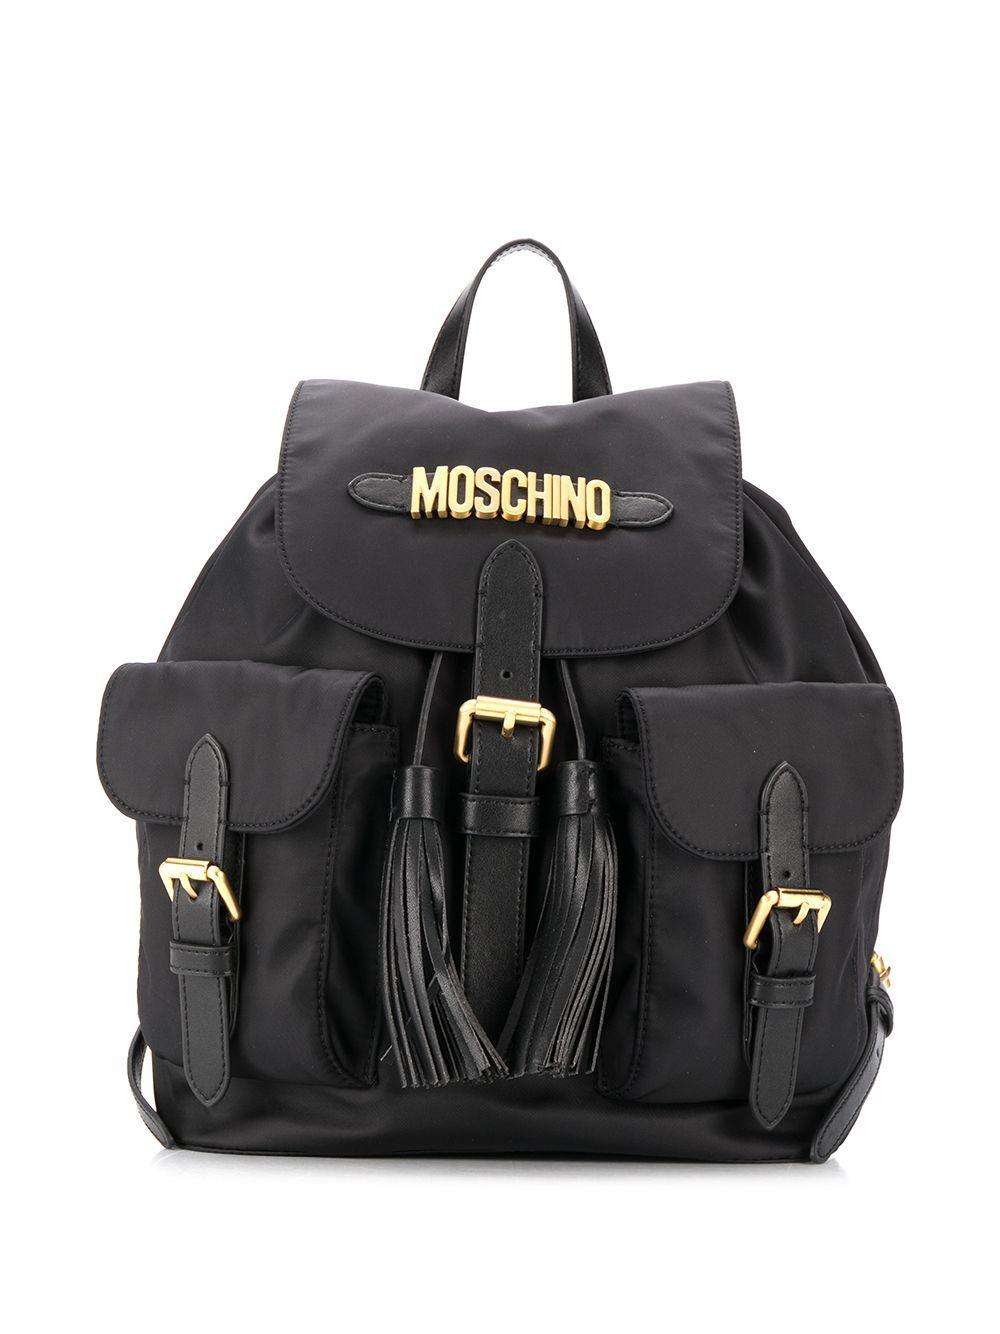 Moschino borse... nero